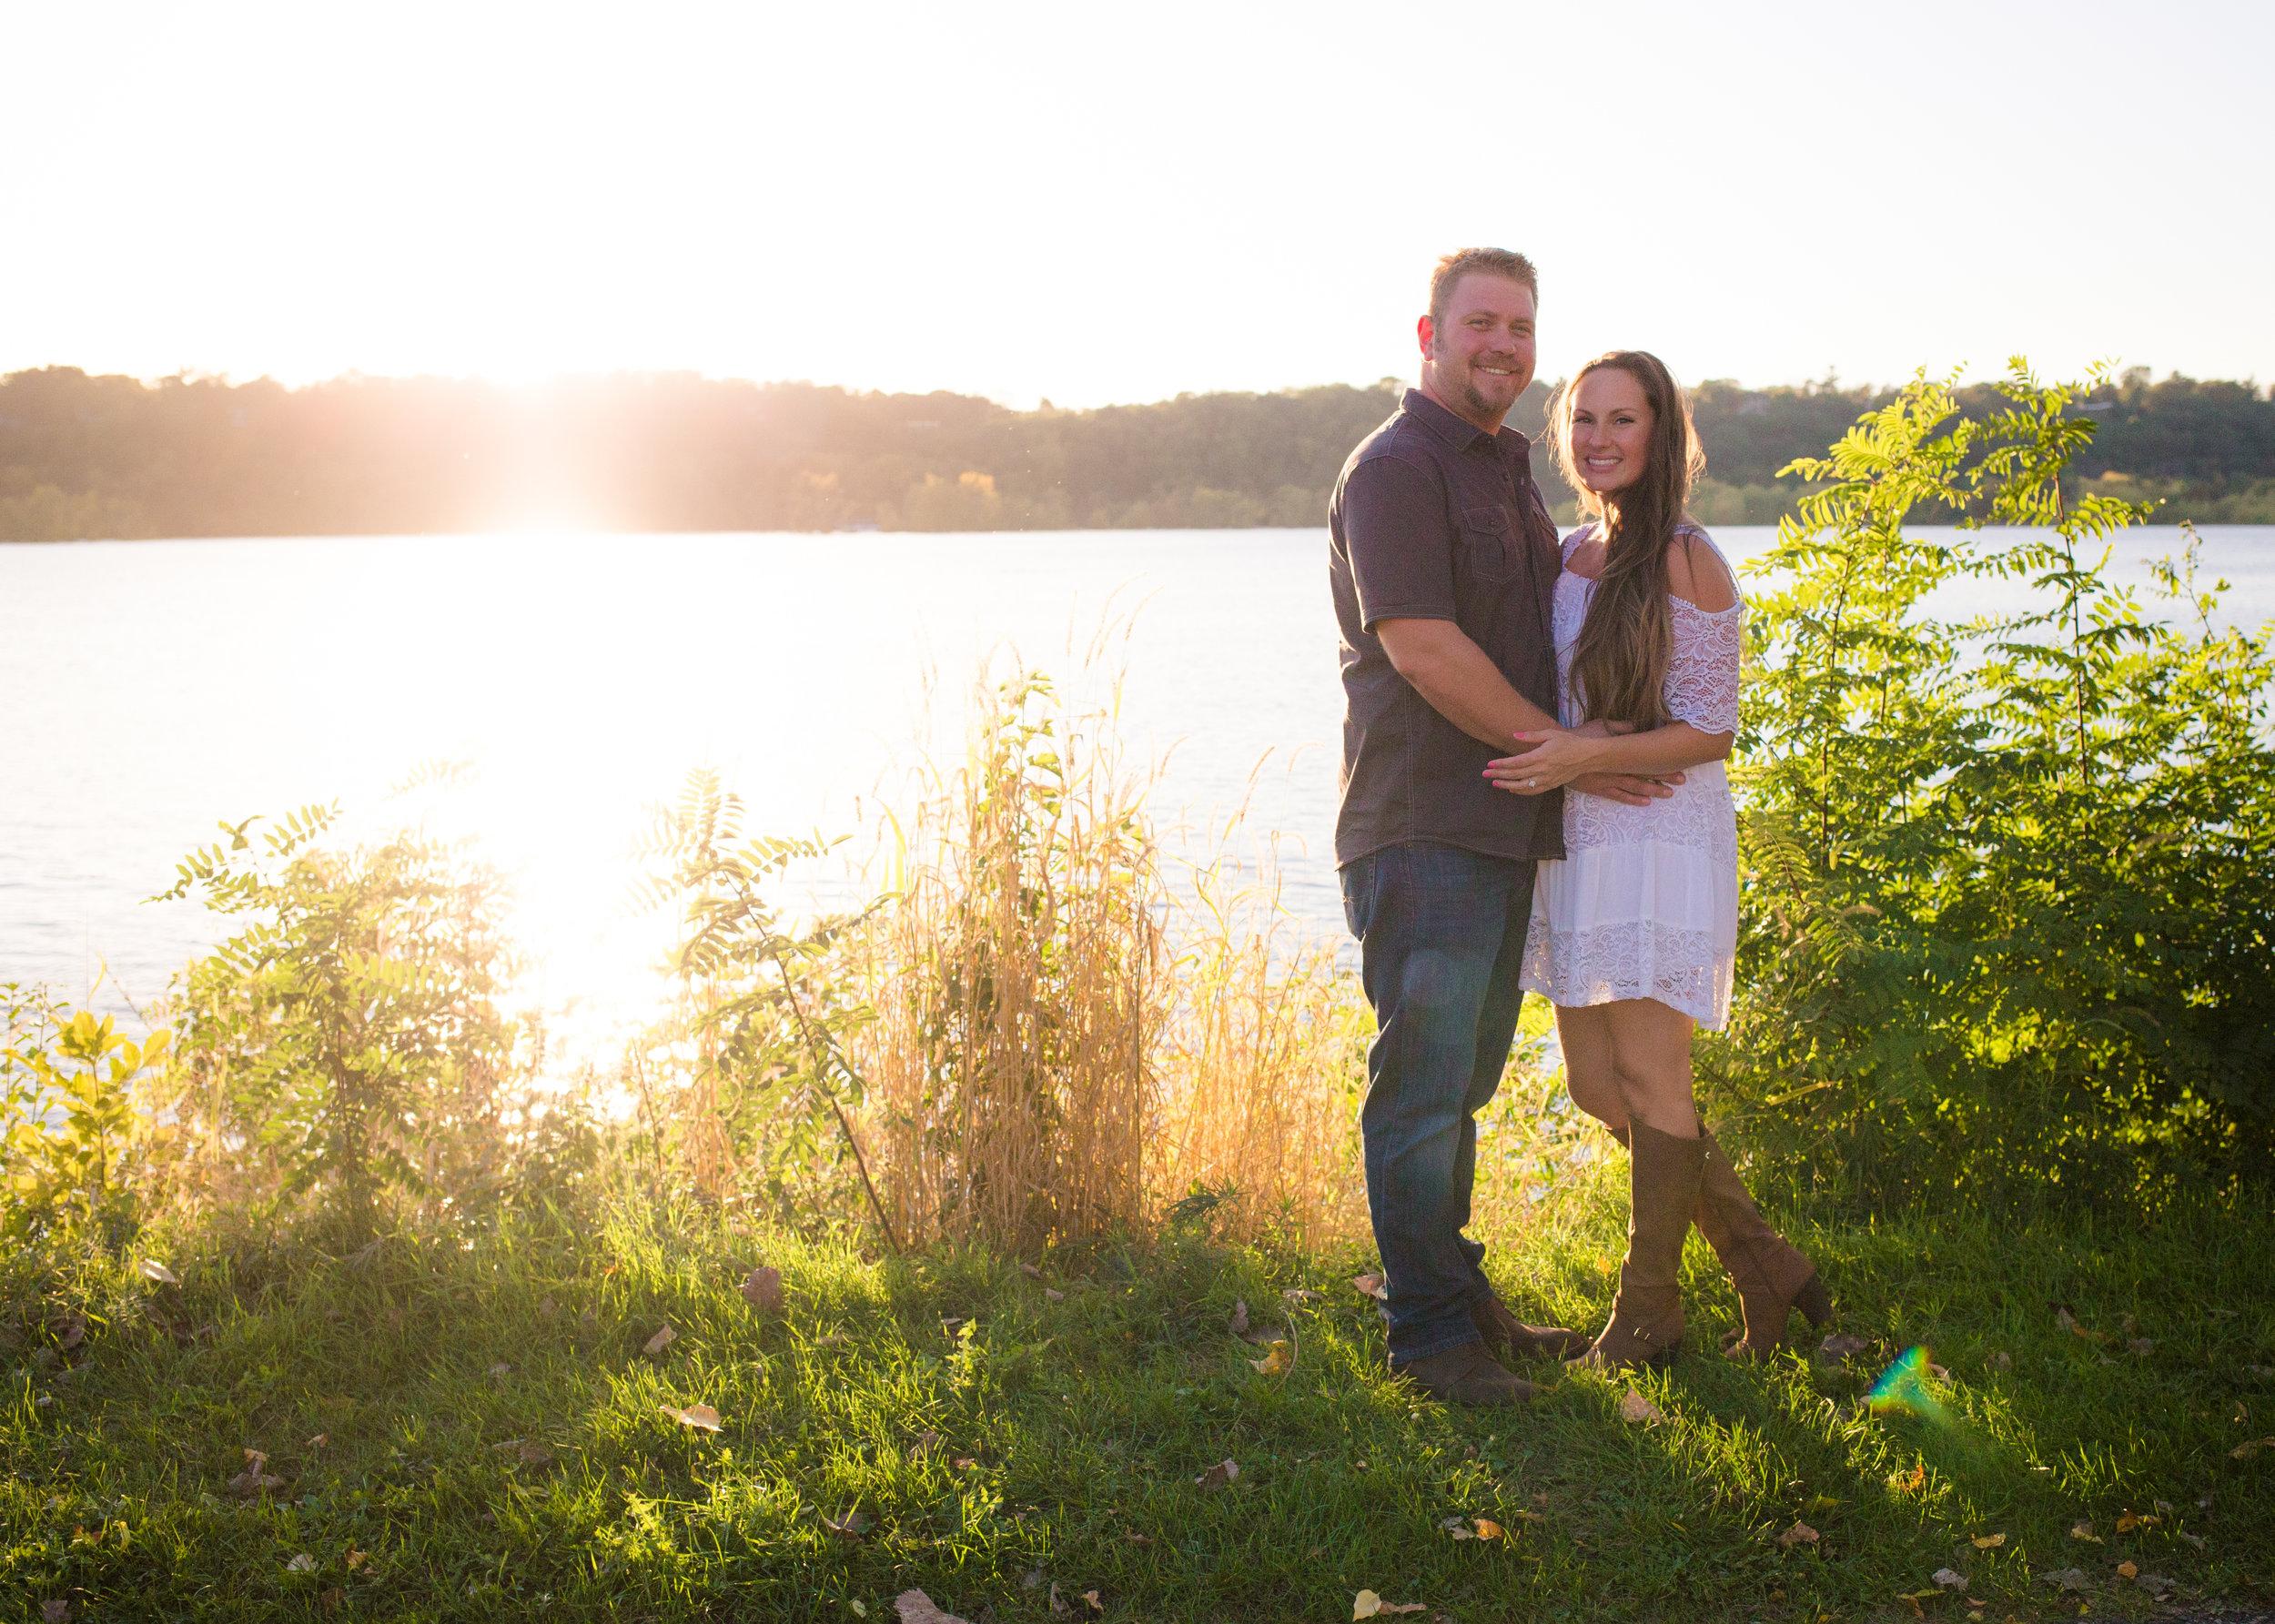 Tori & Nate Engagement - Alycia Faye Photography -0115.jpg